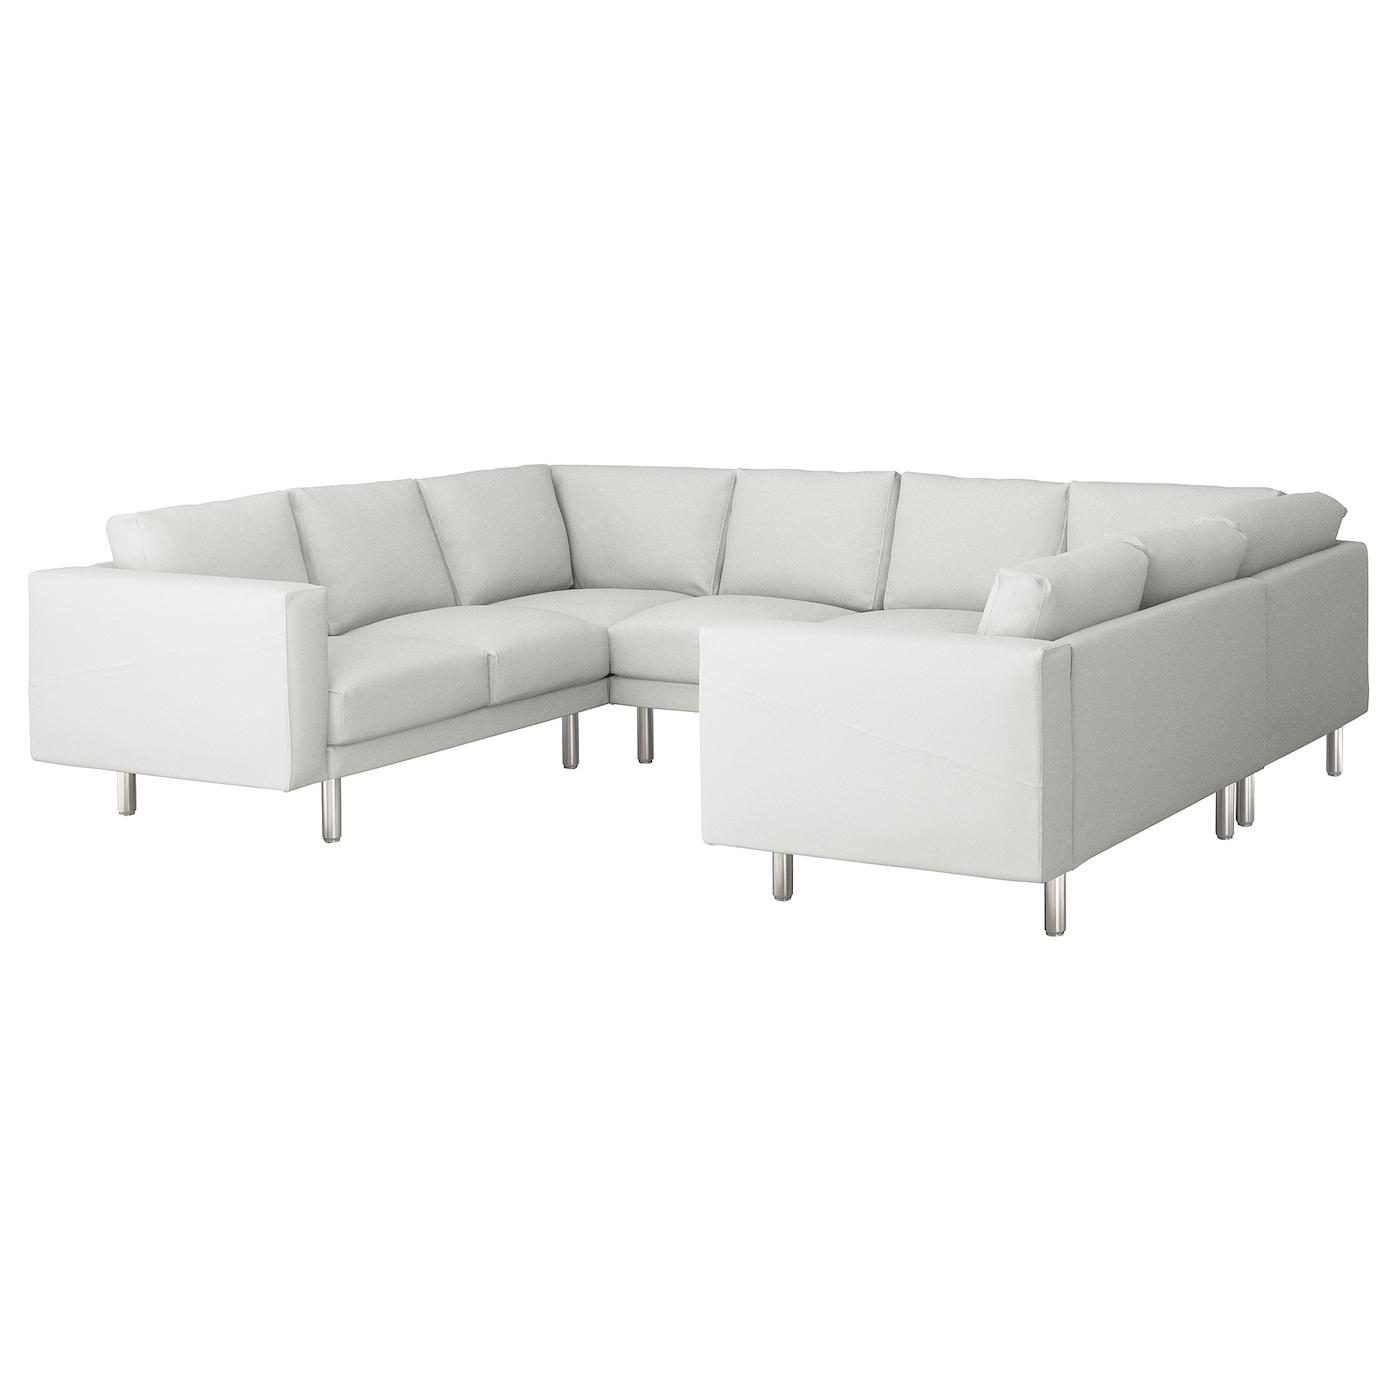 Norsborg u shaped sofa 6 seat finnsta white metal ikea for U shaped sectional sofa ikea